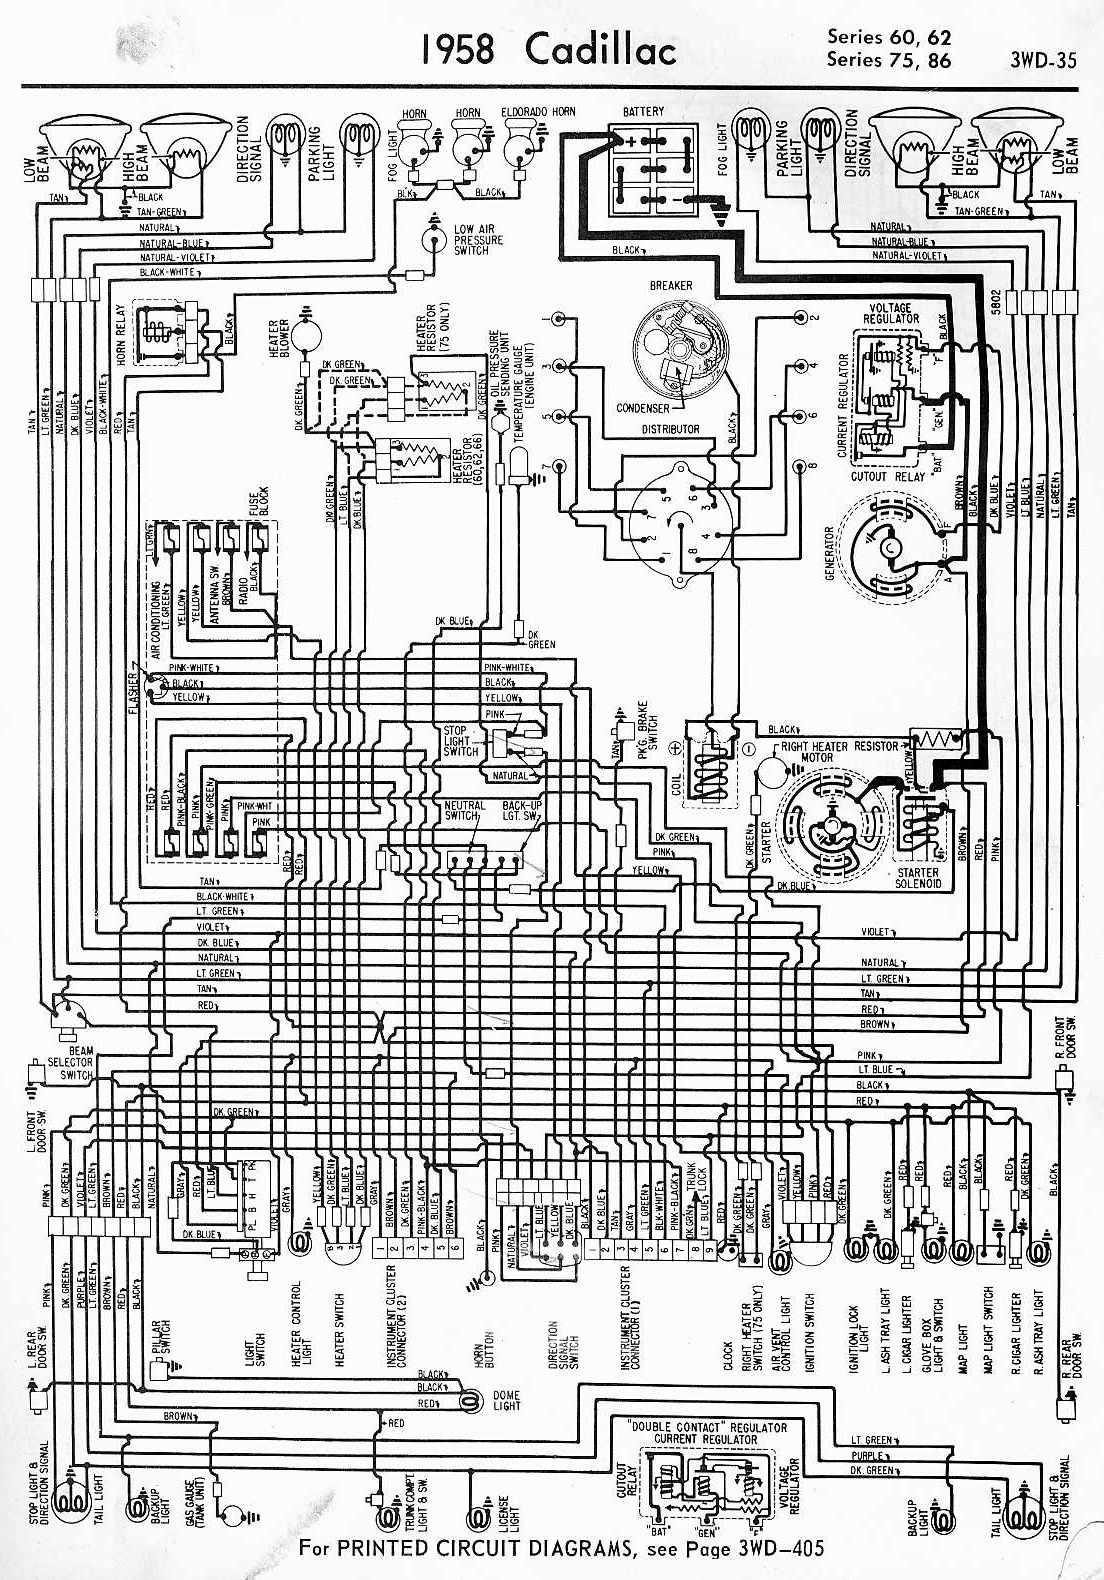 Cadillac  car manuals, wiring diagrams PDF & fault codes